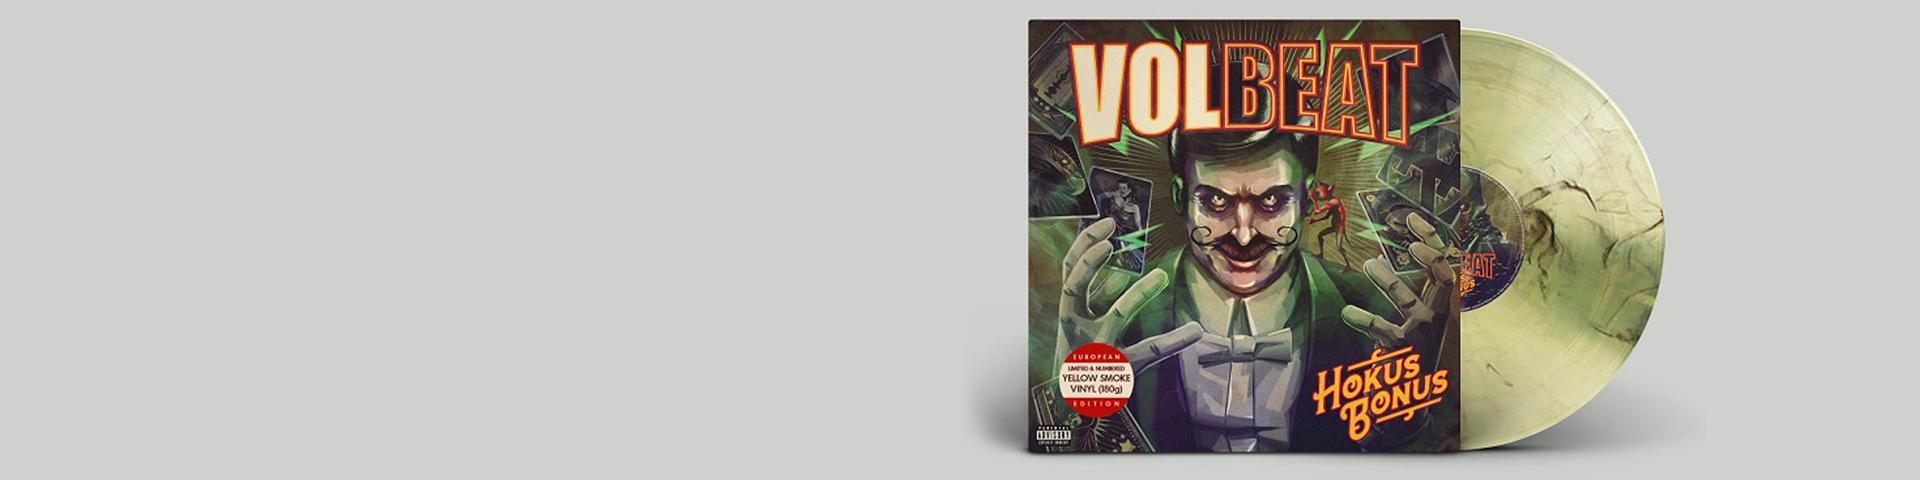 /v/o/volbeat-hokus-bonus-vinyl-limited.png